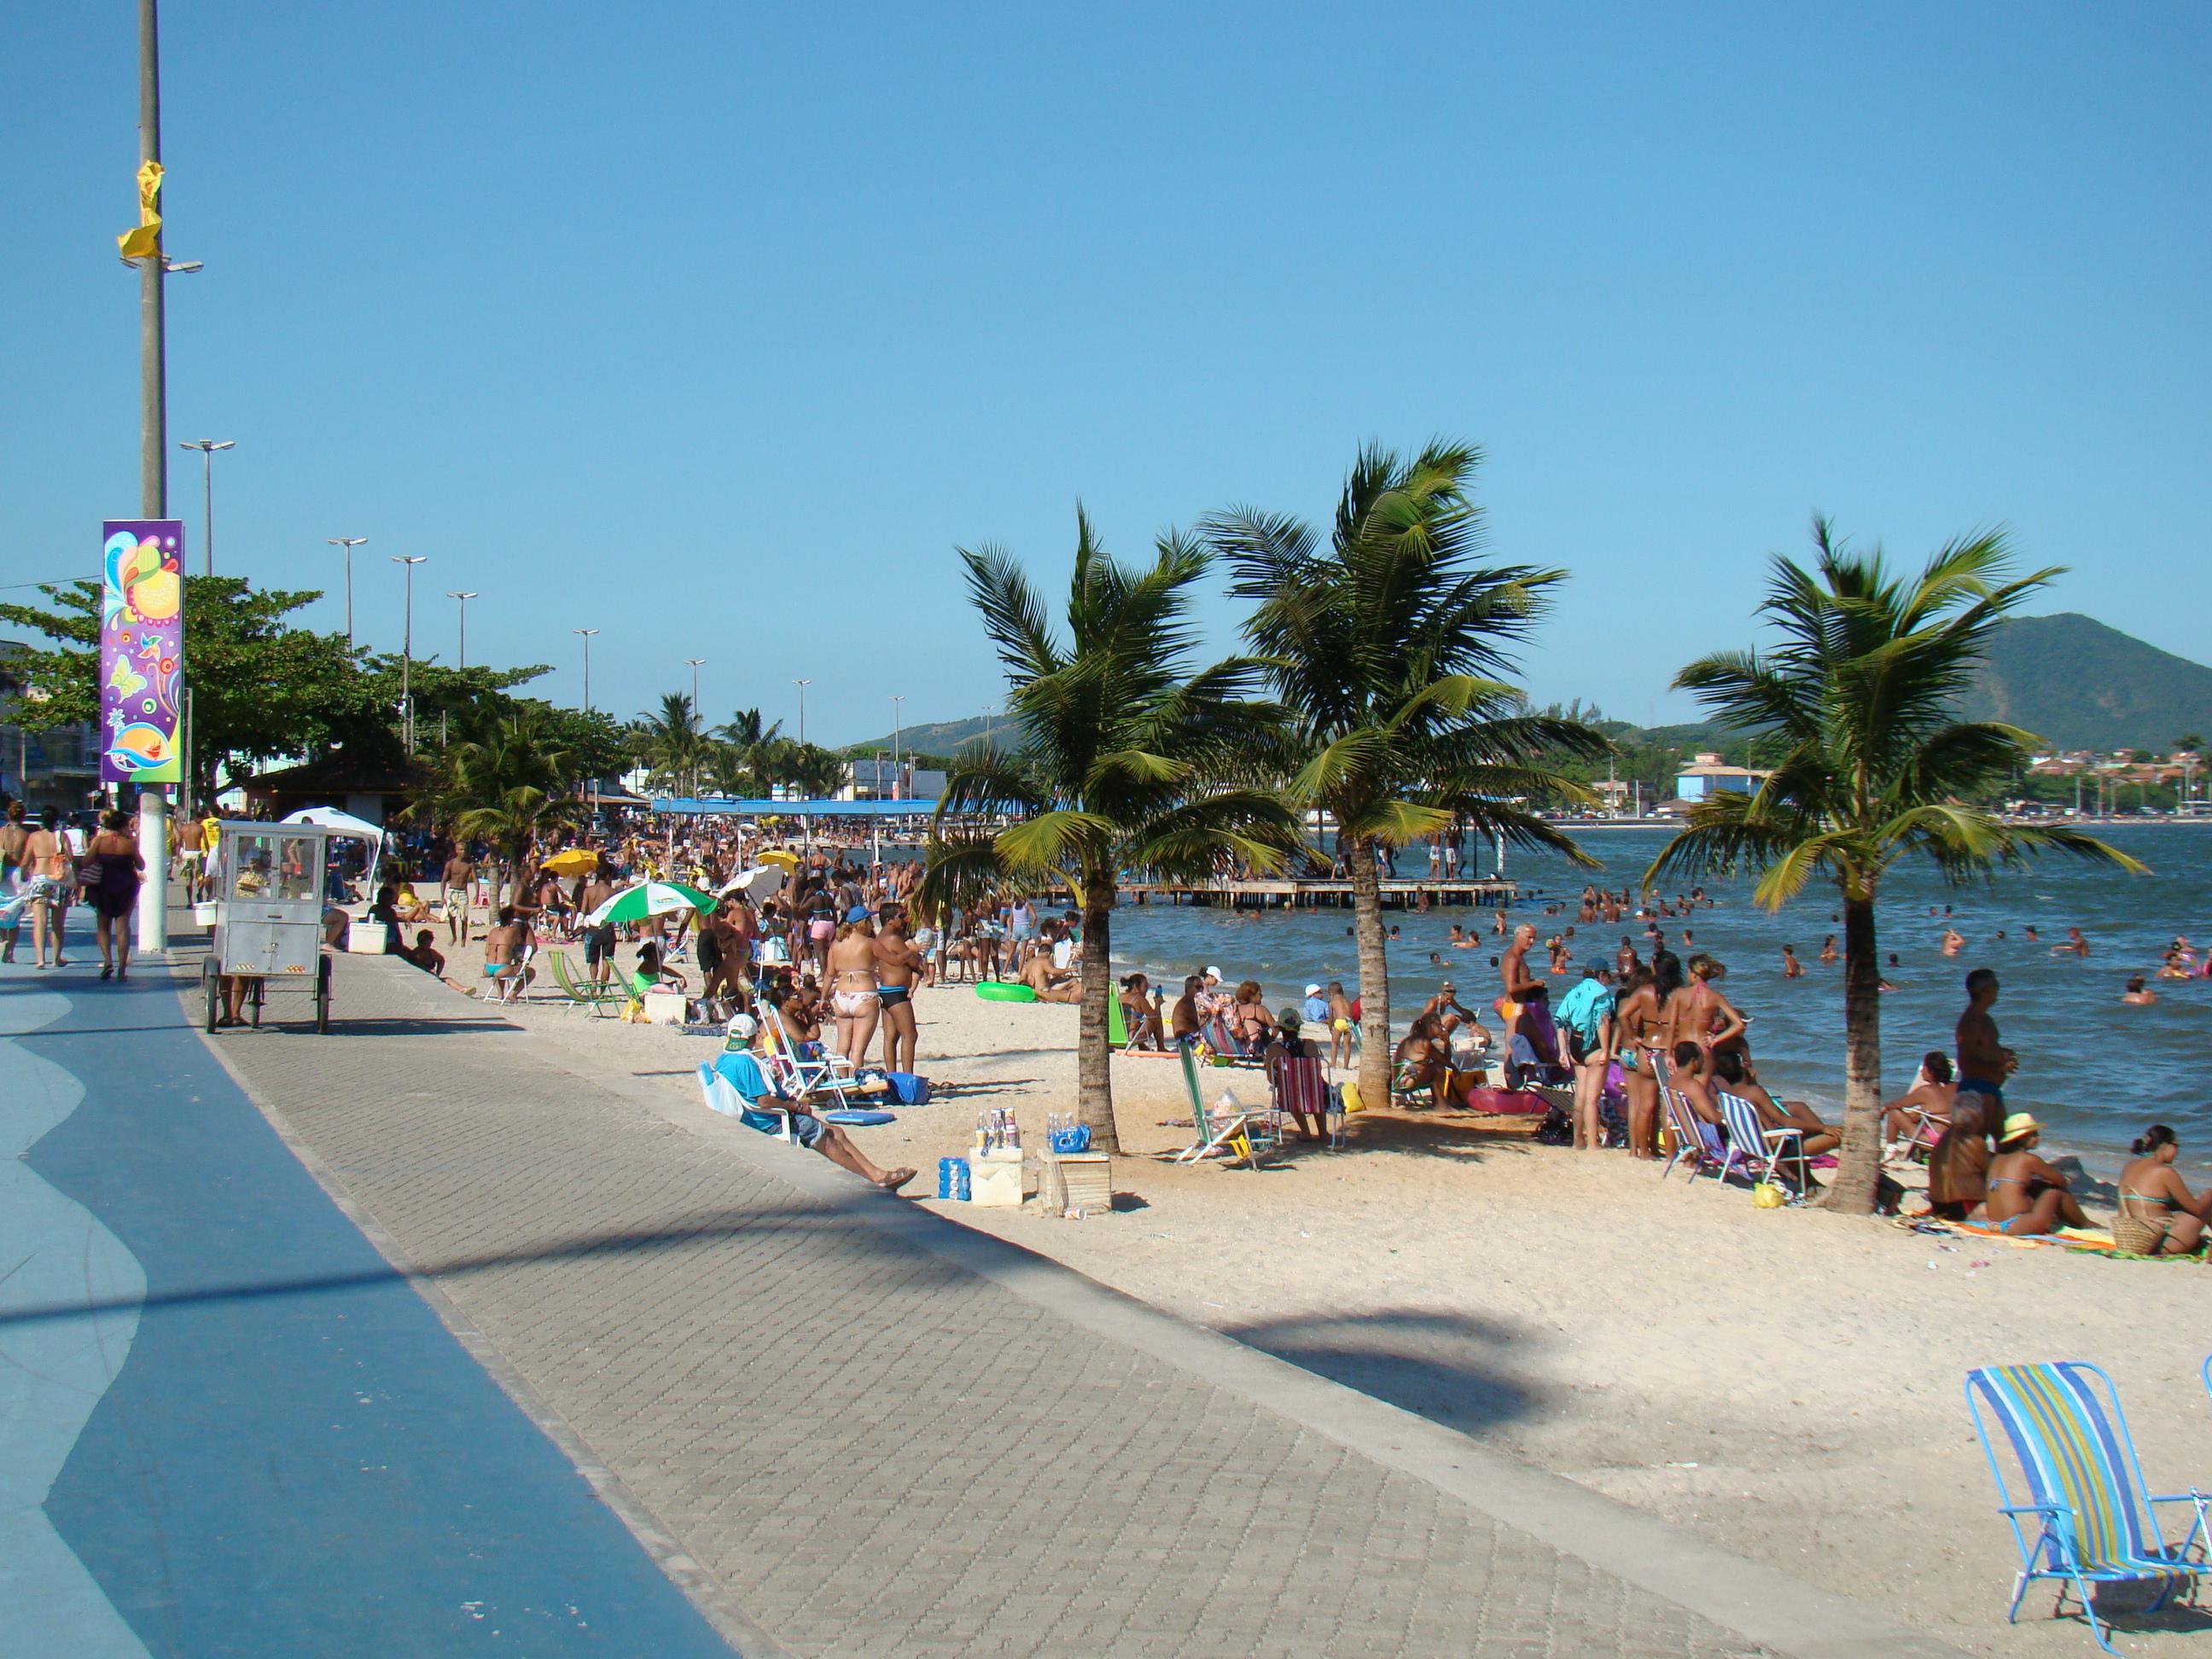 Iguaba Grande entra no Mapa do Turismo Brasileiro